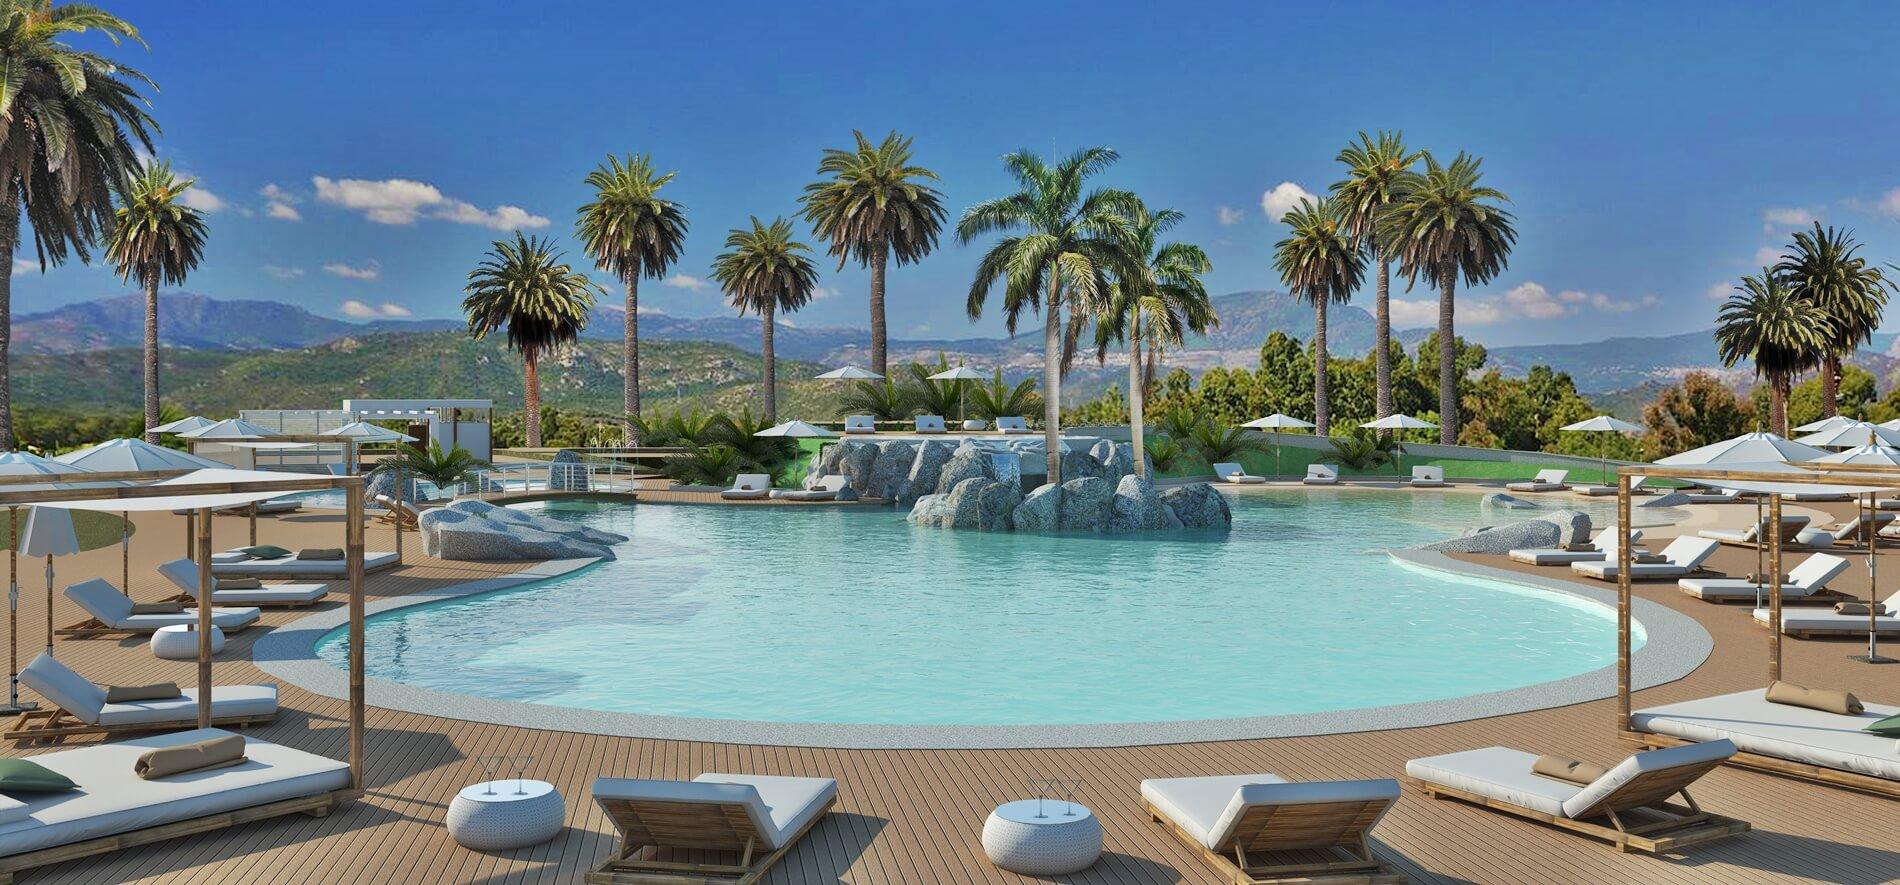 _hotel_club_saraceno_resort_con_piscina_sardegna_06